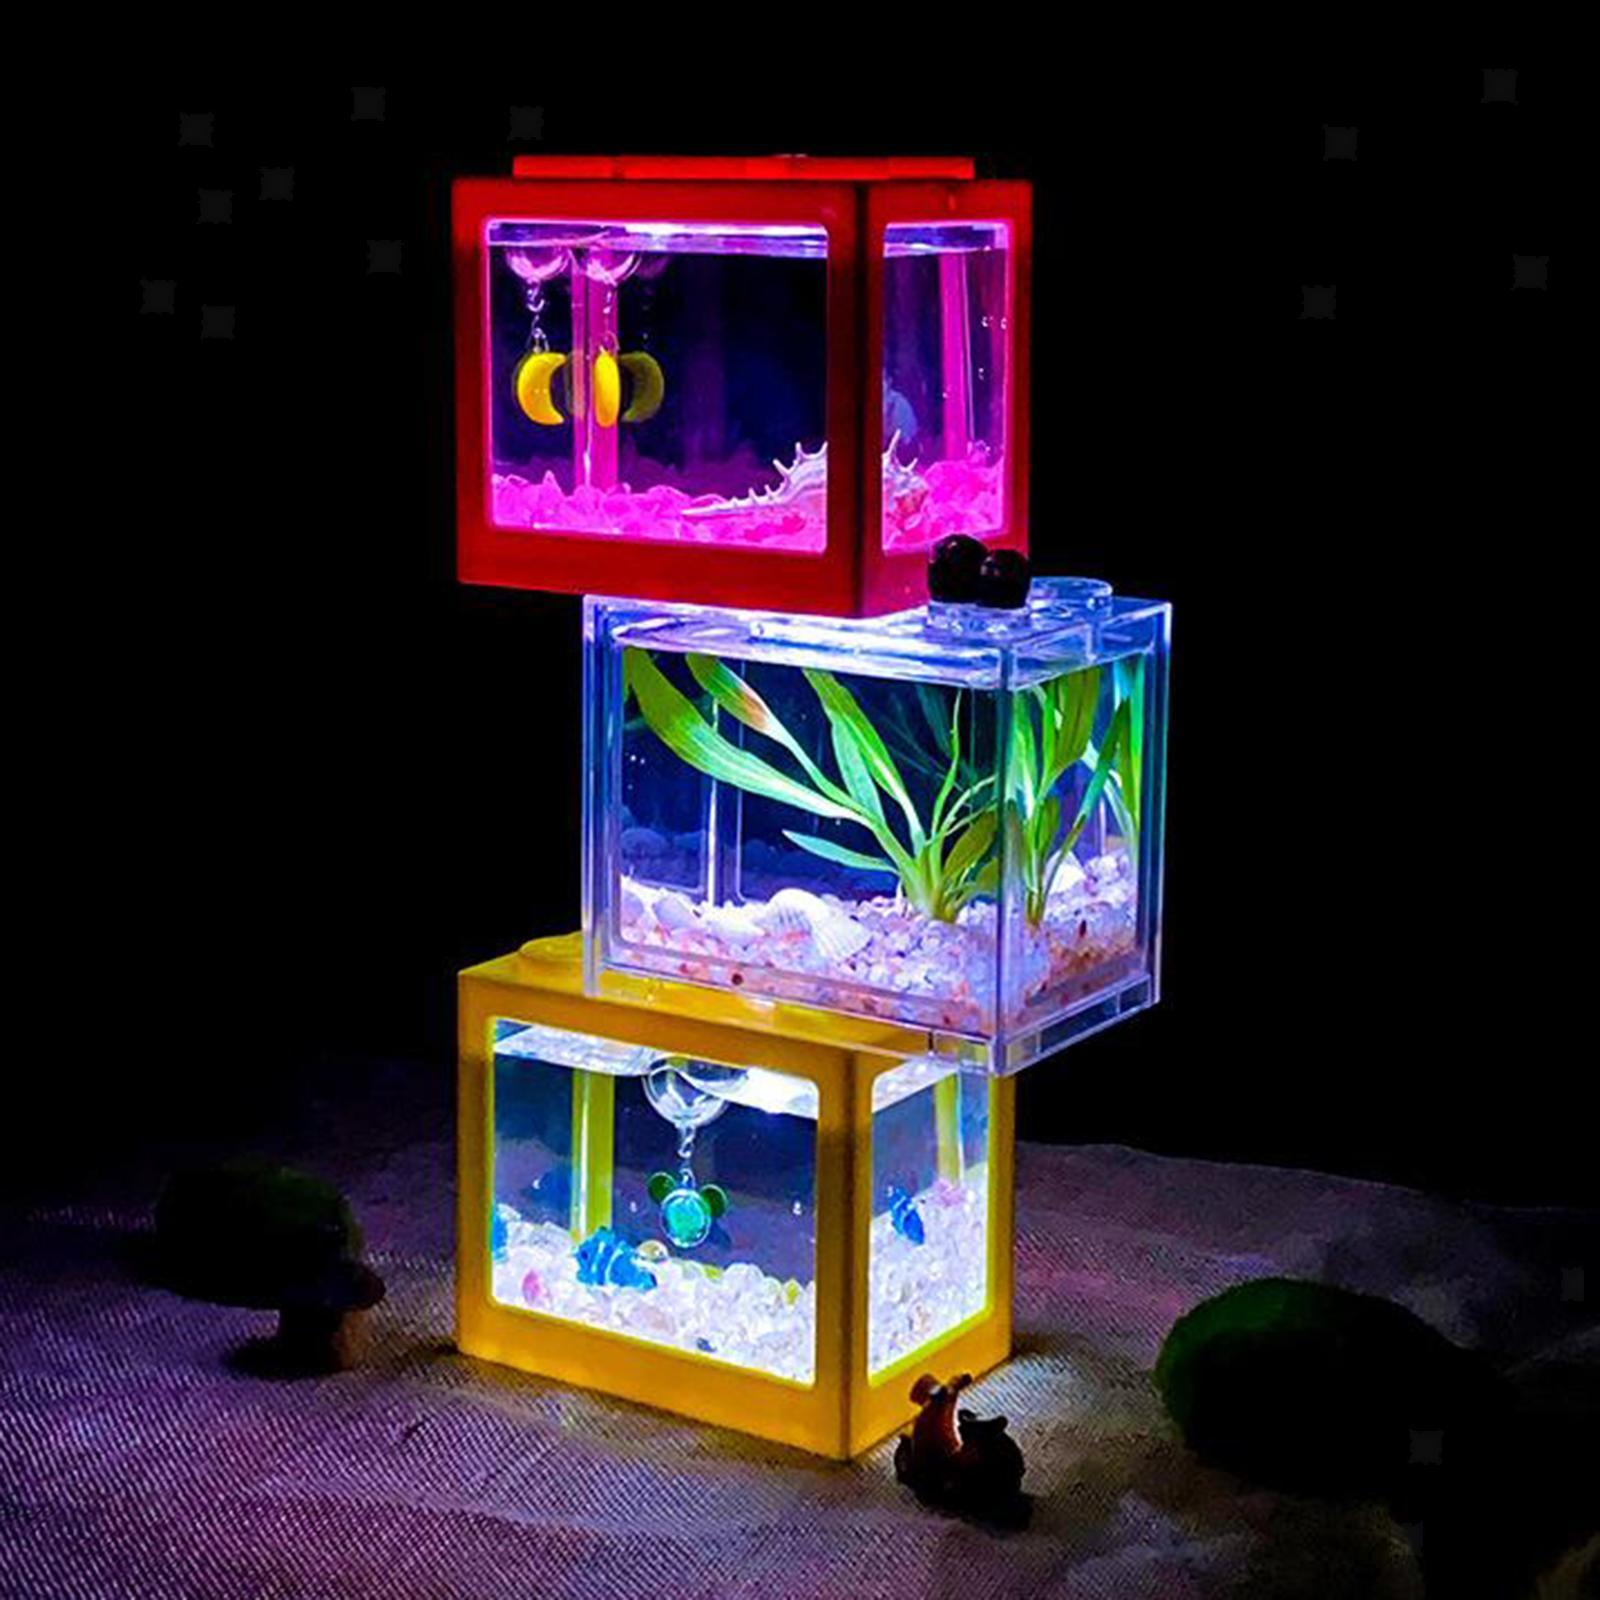 Mini Usb Aquarium With Lcd Display Desktop Fish Tank Led Clock Table Lamp White For Sale Online Ebay